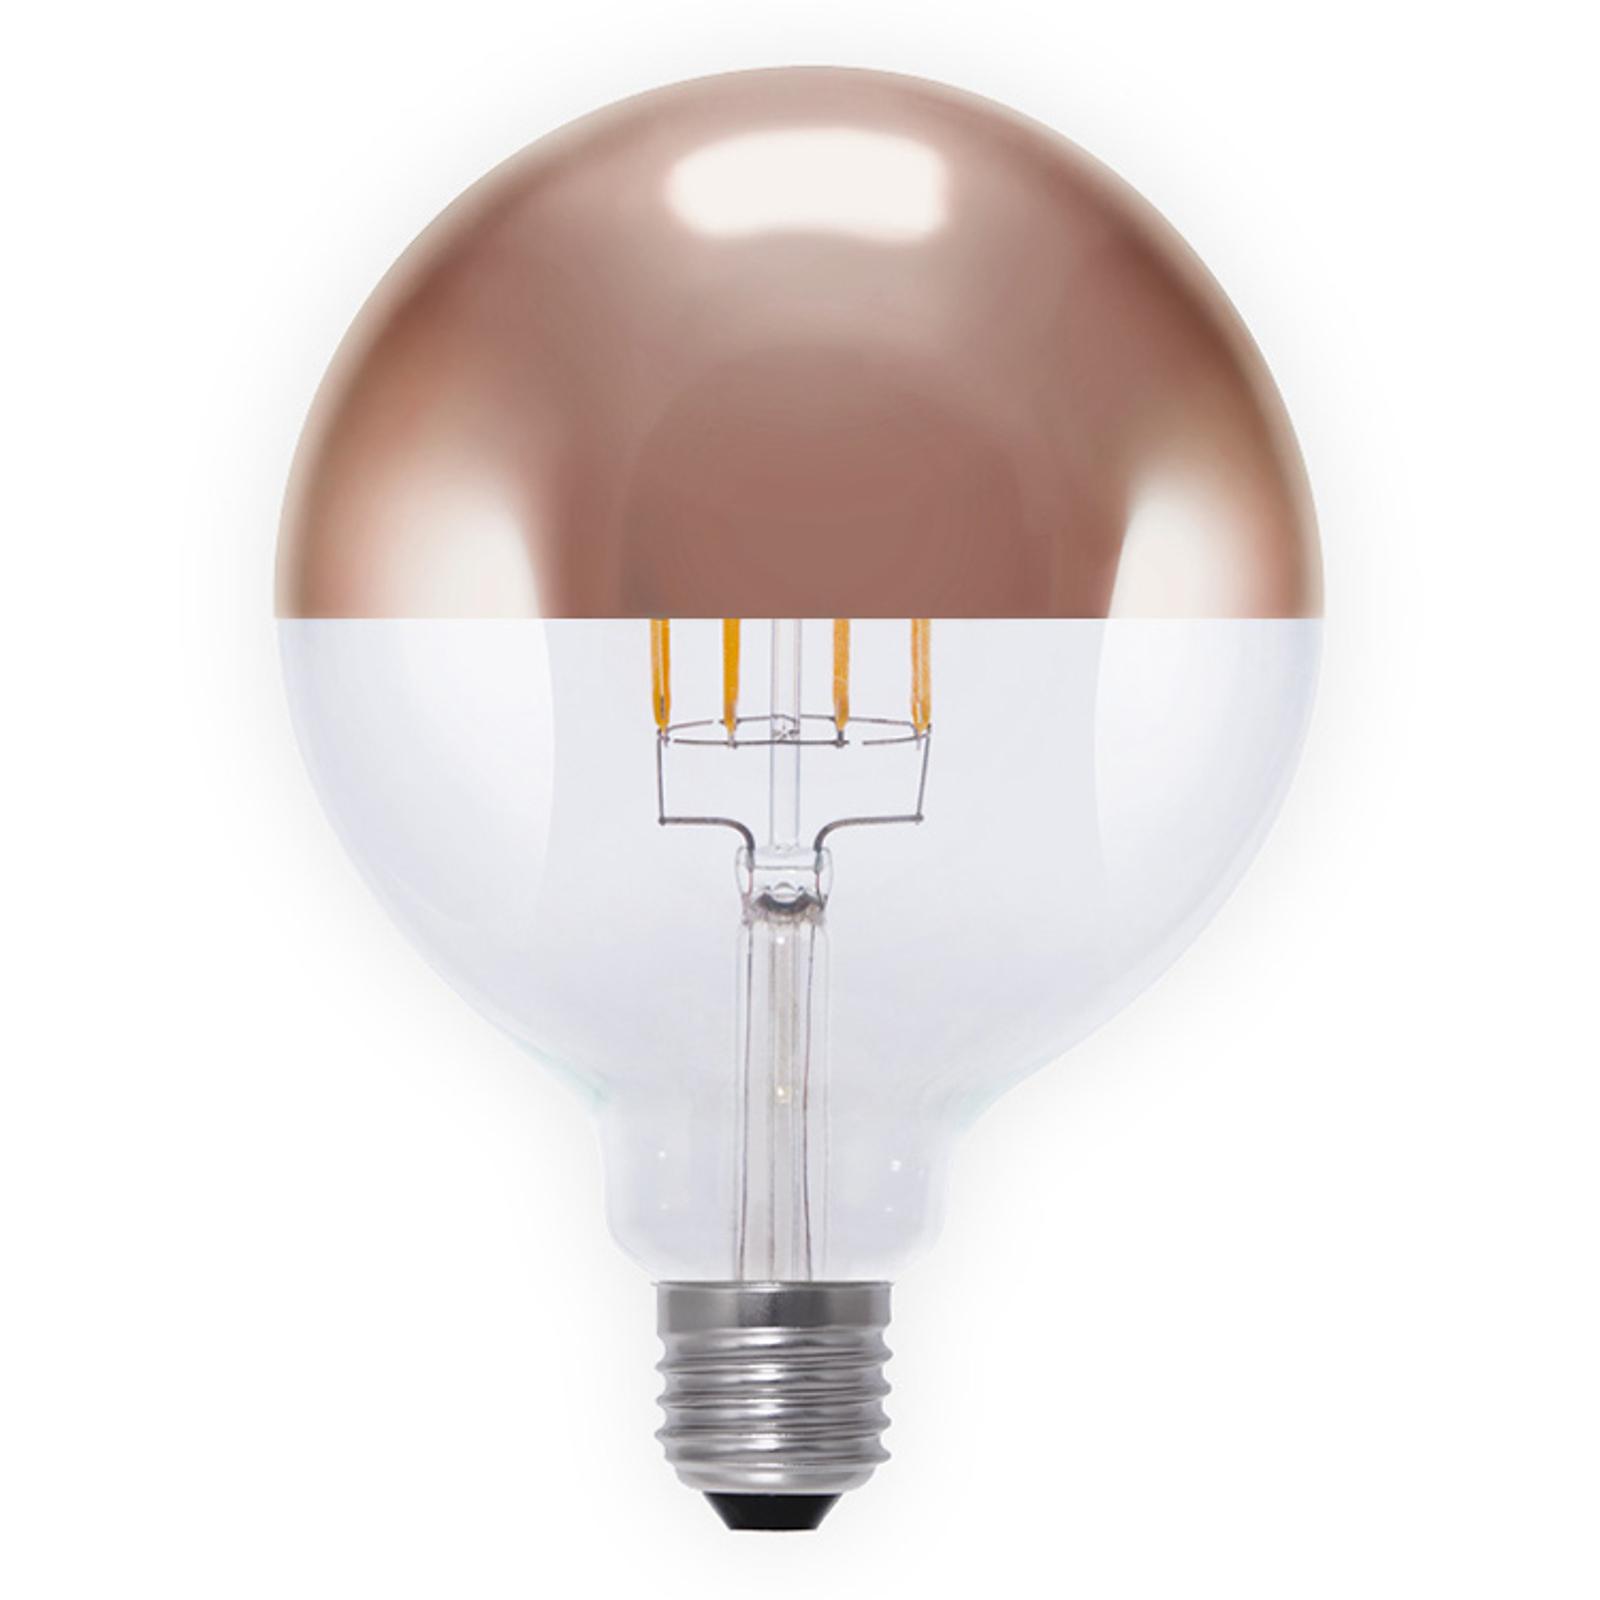 Pallomainen LED-pääpeililamppu G125 E27 8 W 926